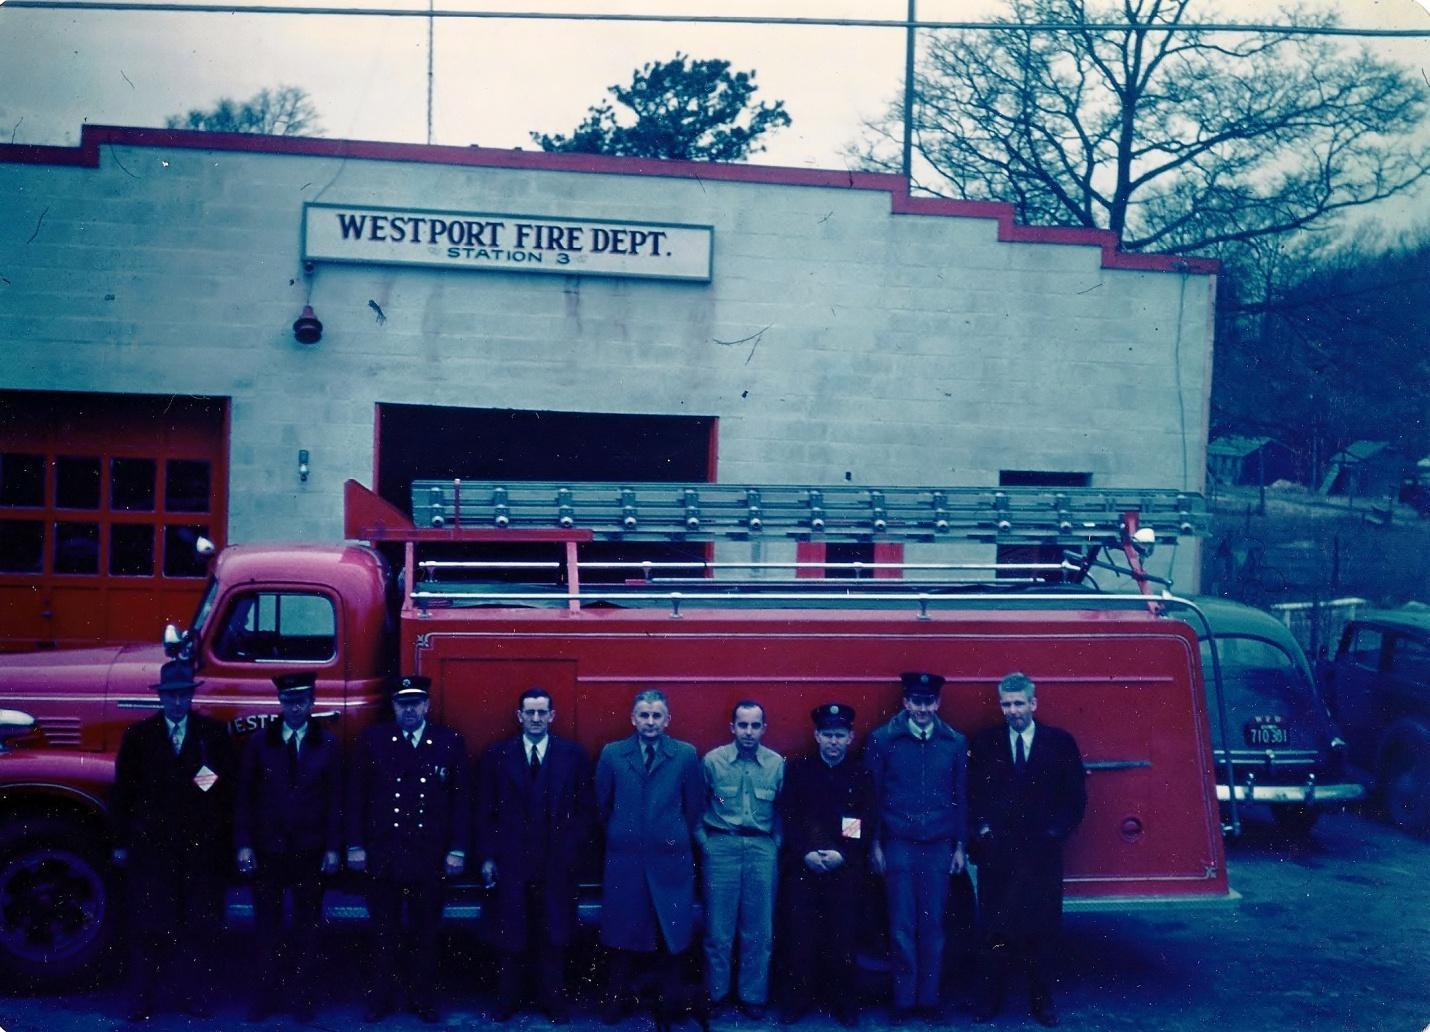 C:\Users\sam\Dropbox\Archive\Archicive\Westport Station 3 March 1955.jpg